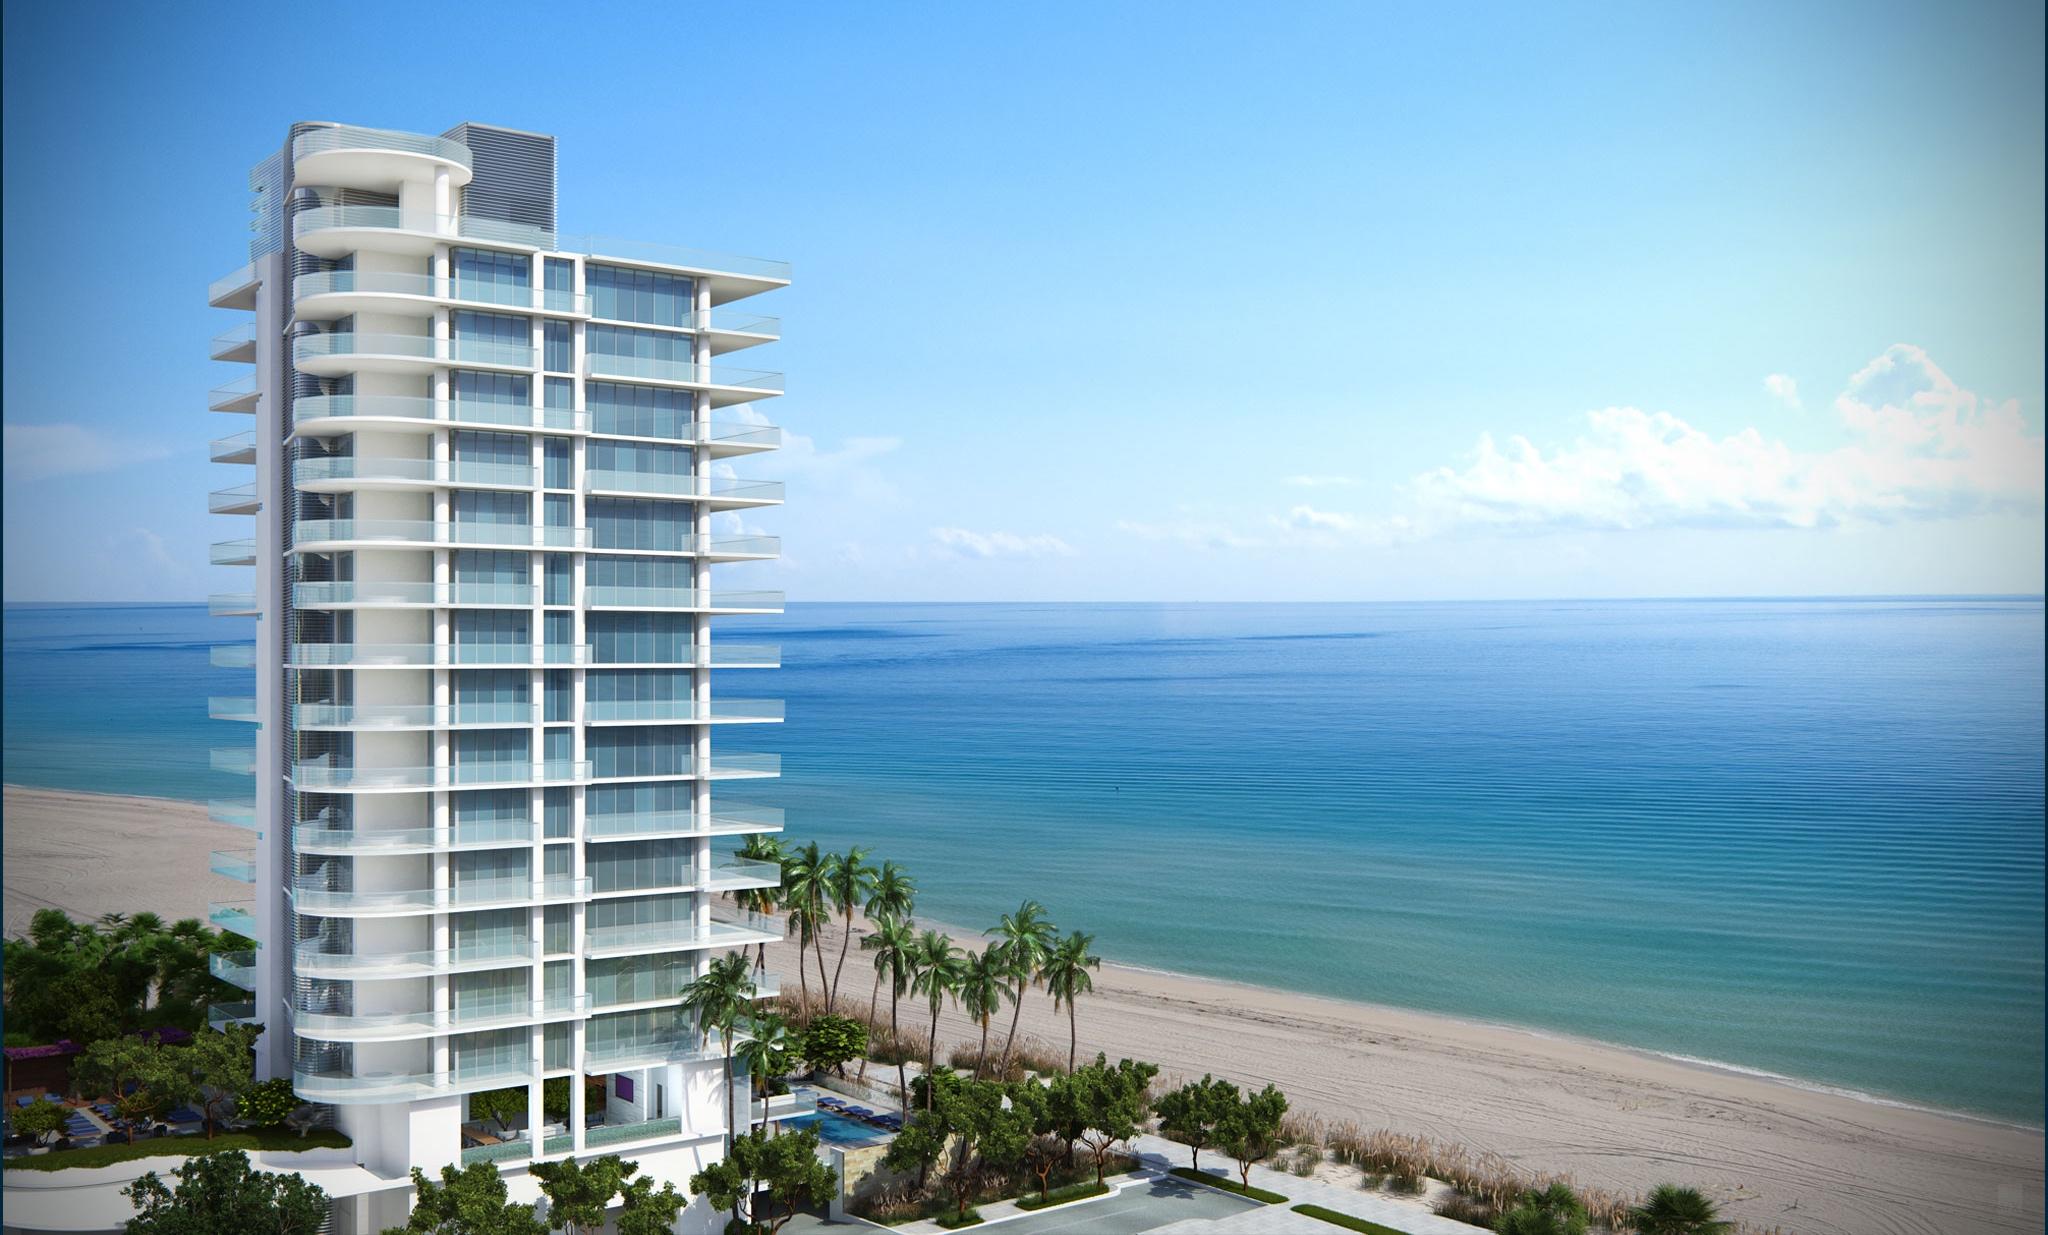 Penthouse at L'Atelier Residences, Miami Beach - Building